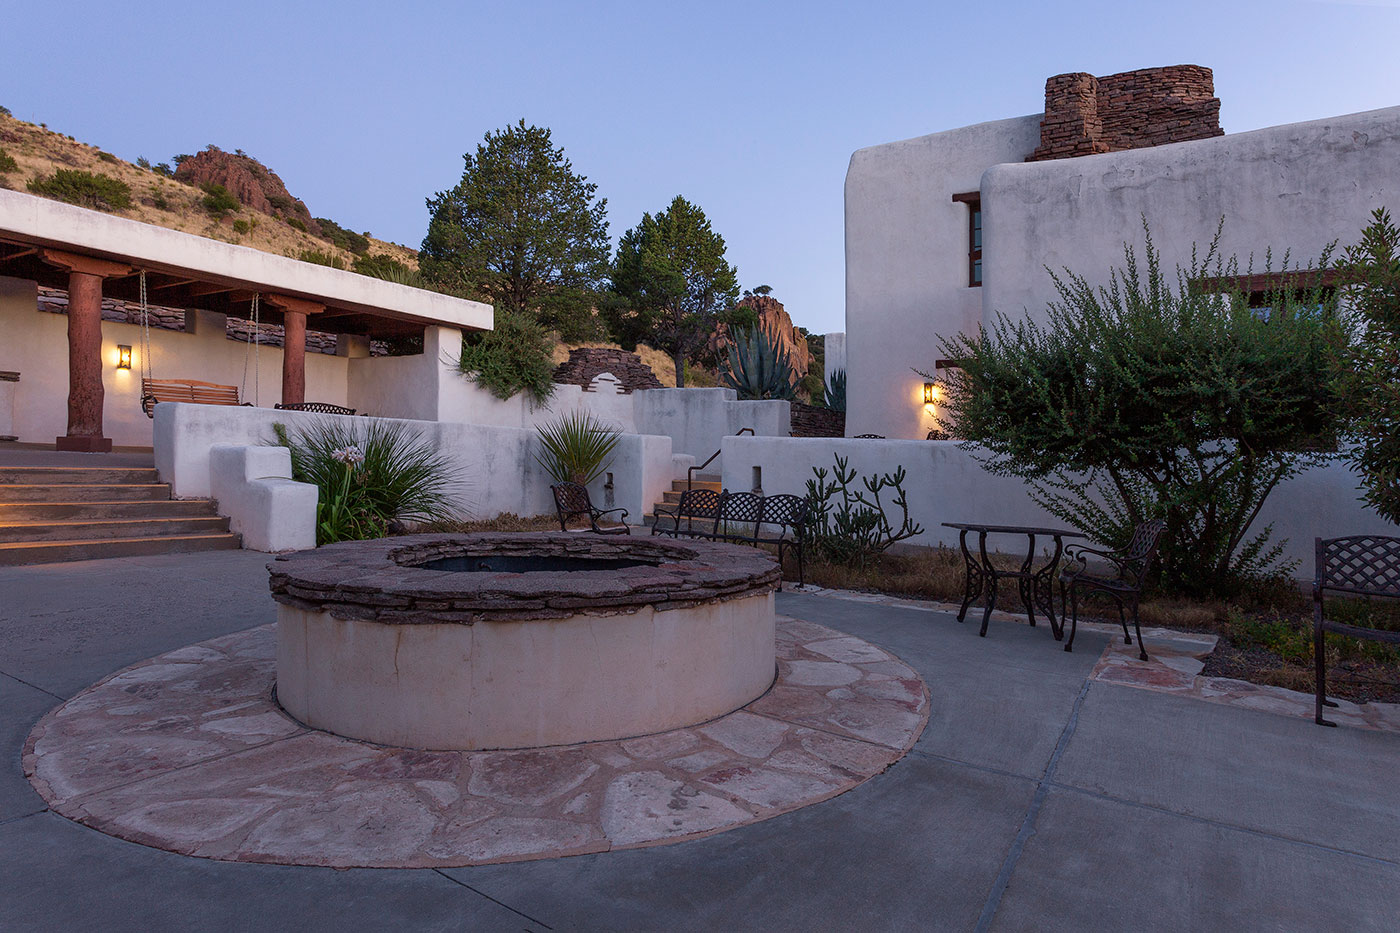 Indian-Lodge_ABP_Courtyard1.jpg